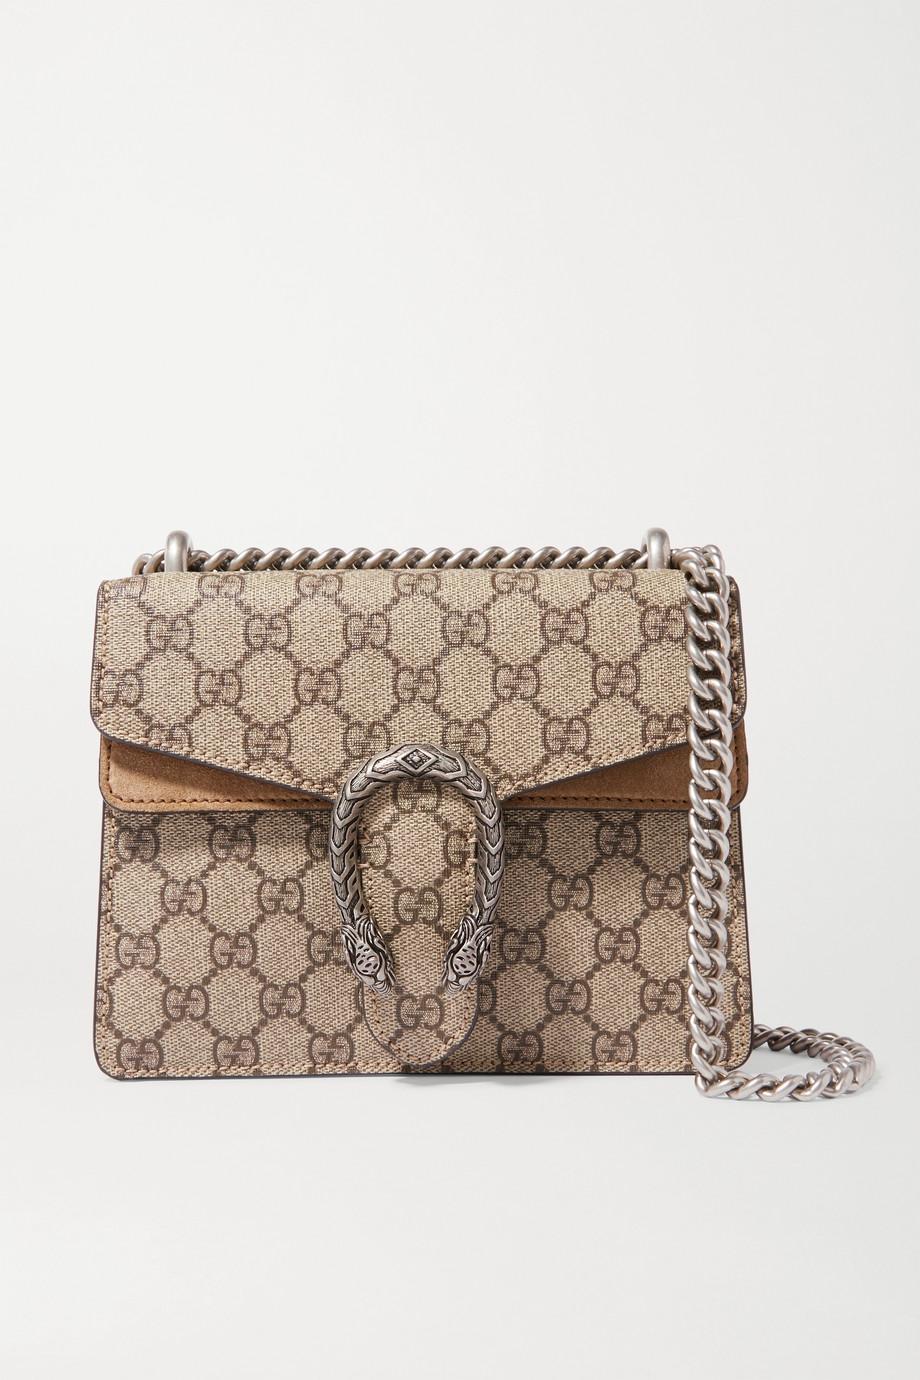 Gucci Dionysus 印花涂层帆布绒面革迷你单肩包